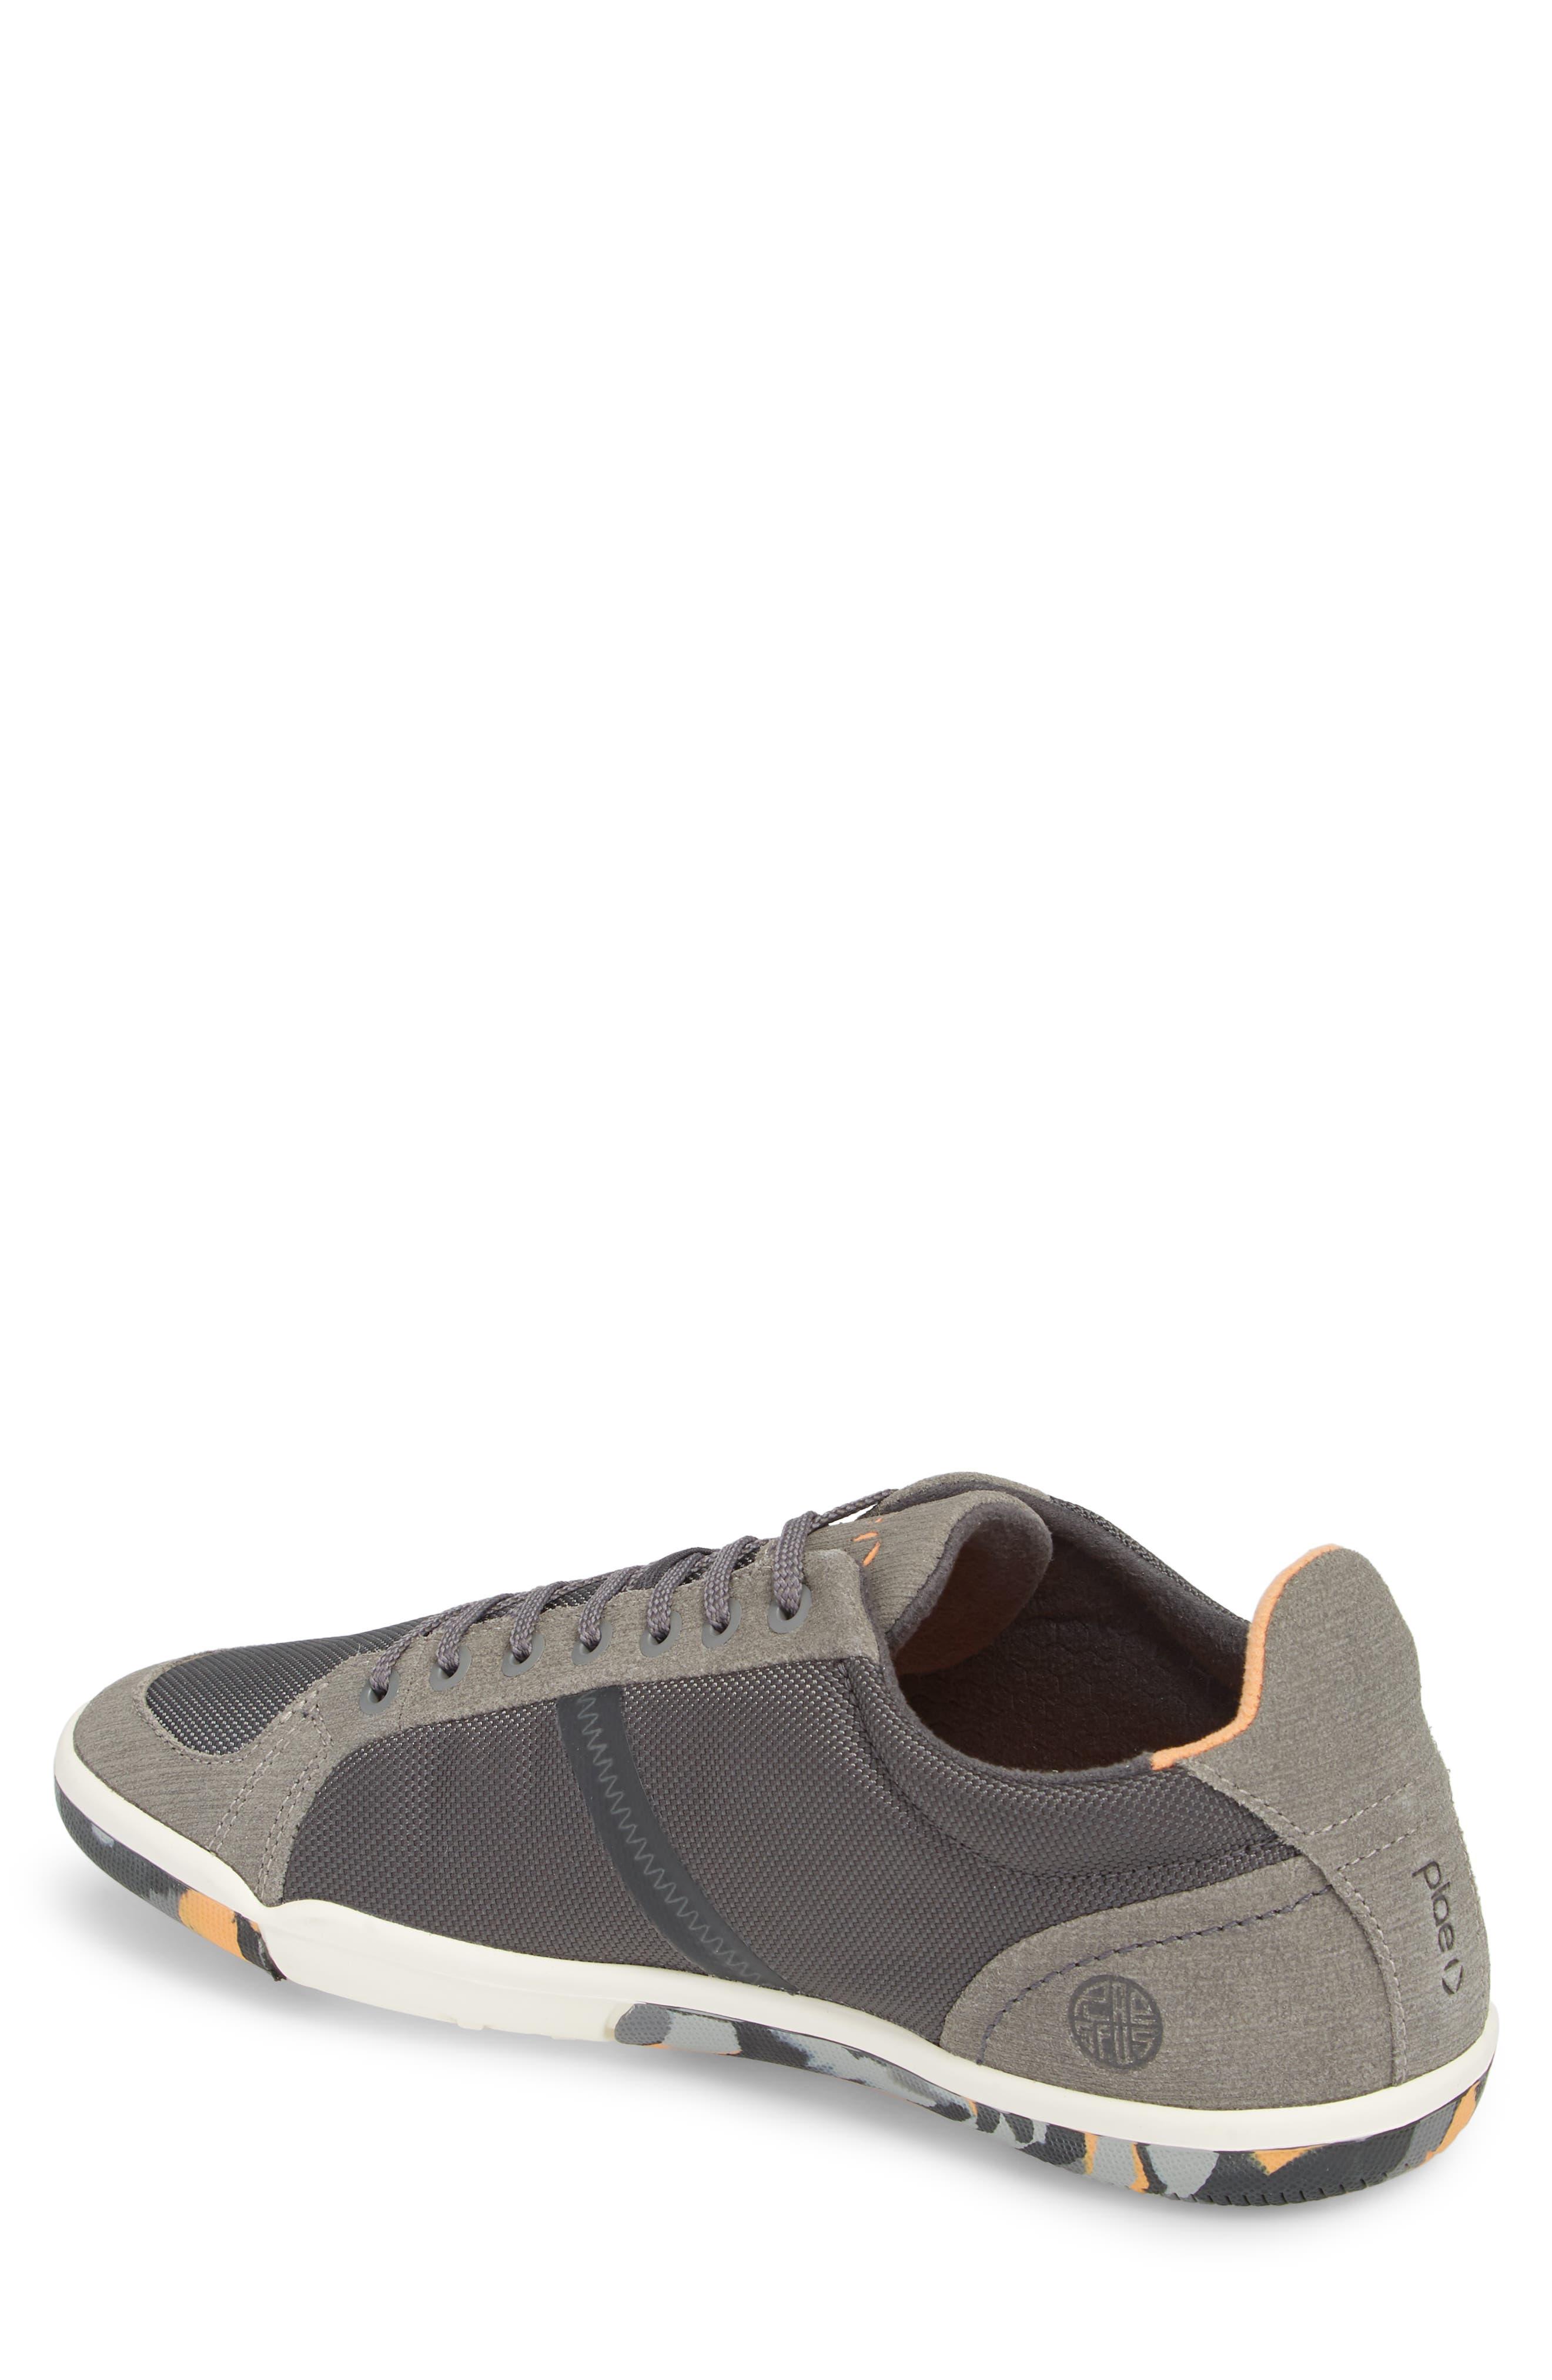 Prospect Low Top Sneaker,                             Alternate thumbnail 2, color,                             070